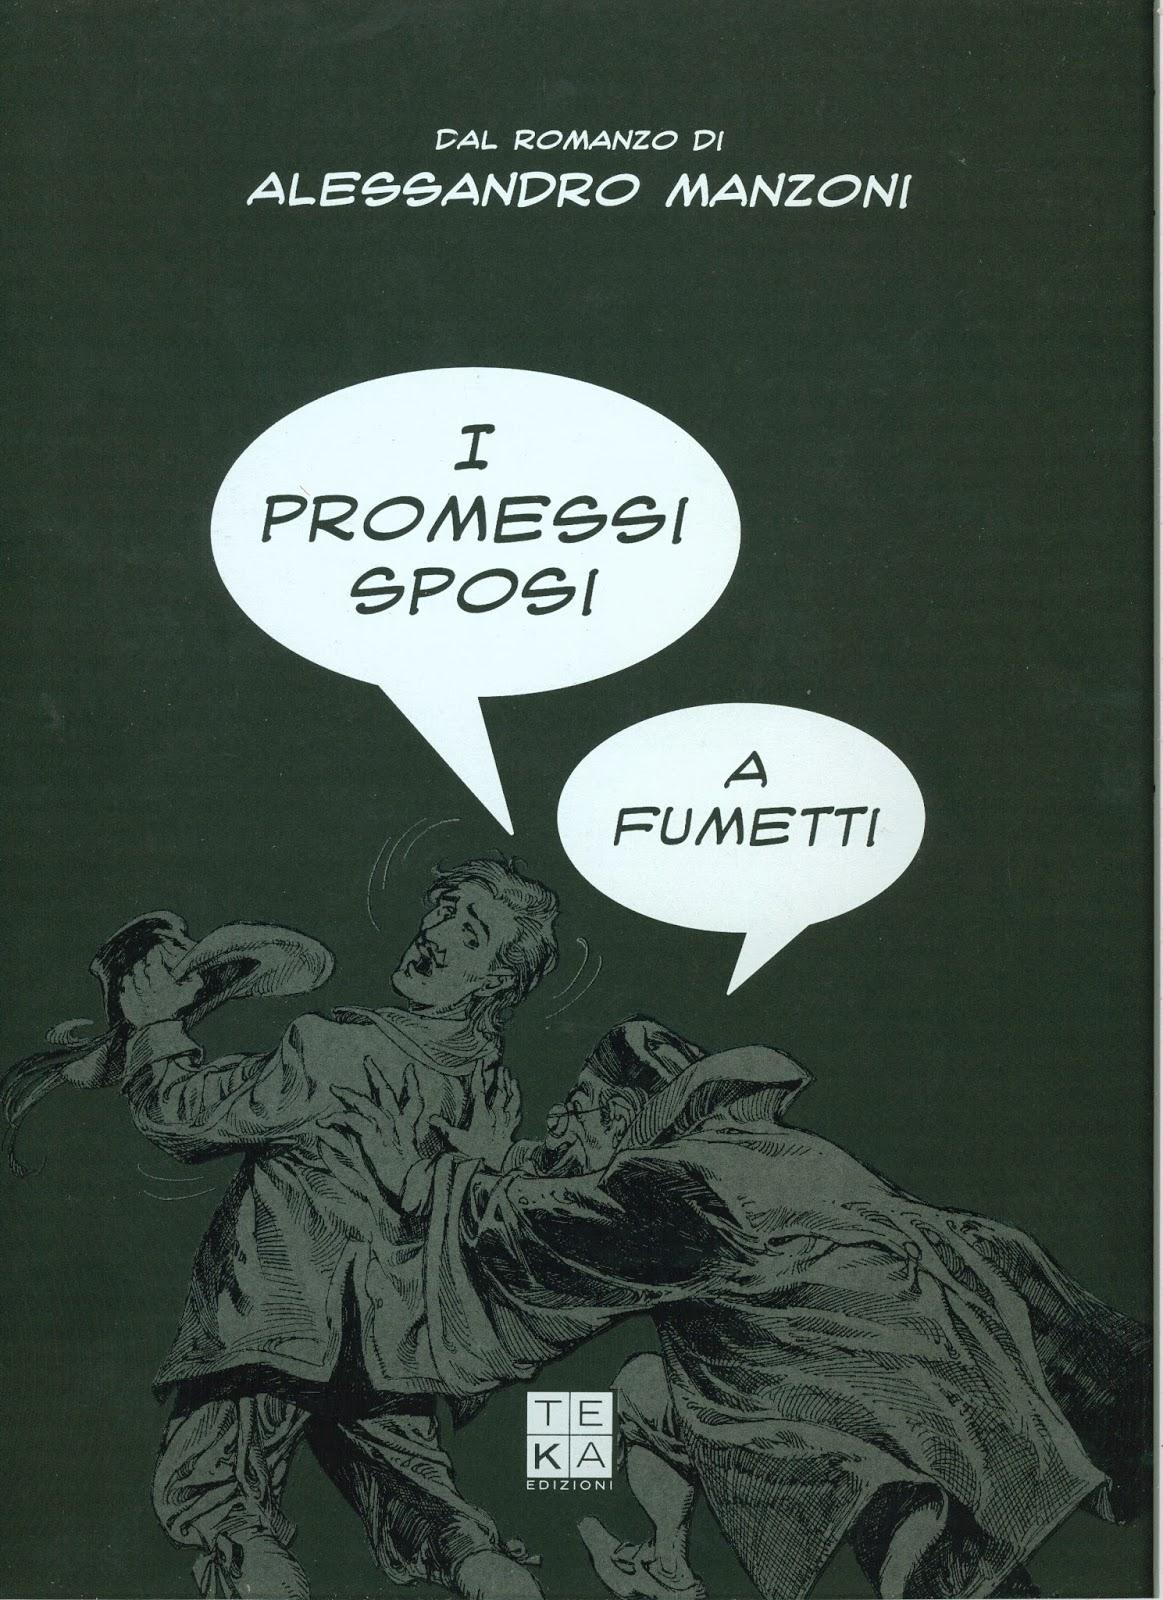 Libreria Torriani di Canzo: I Promessi sposi a fumetti (Teka Edizioni)